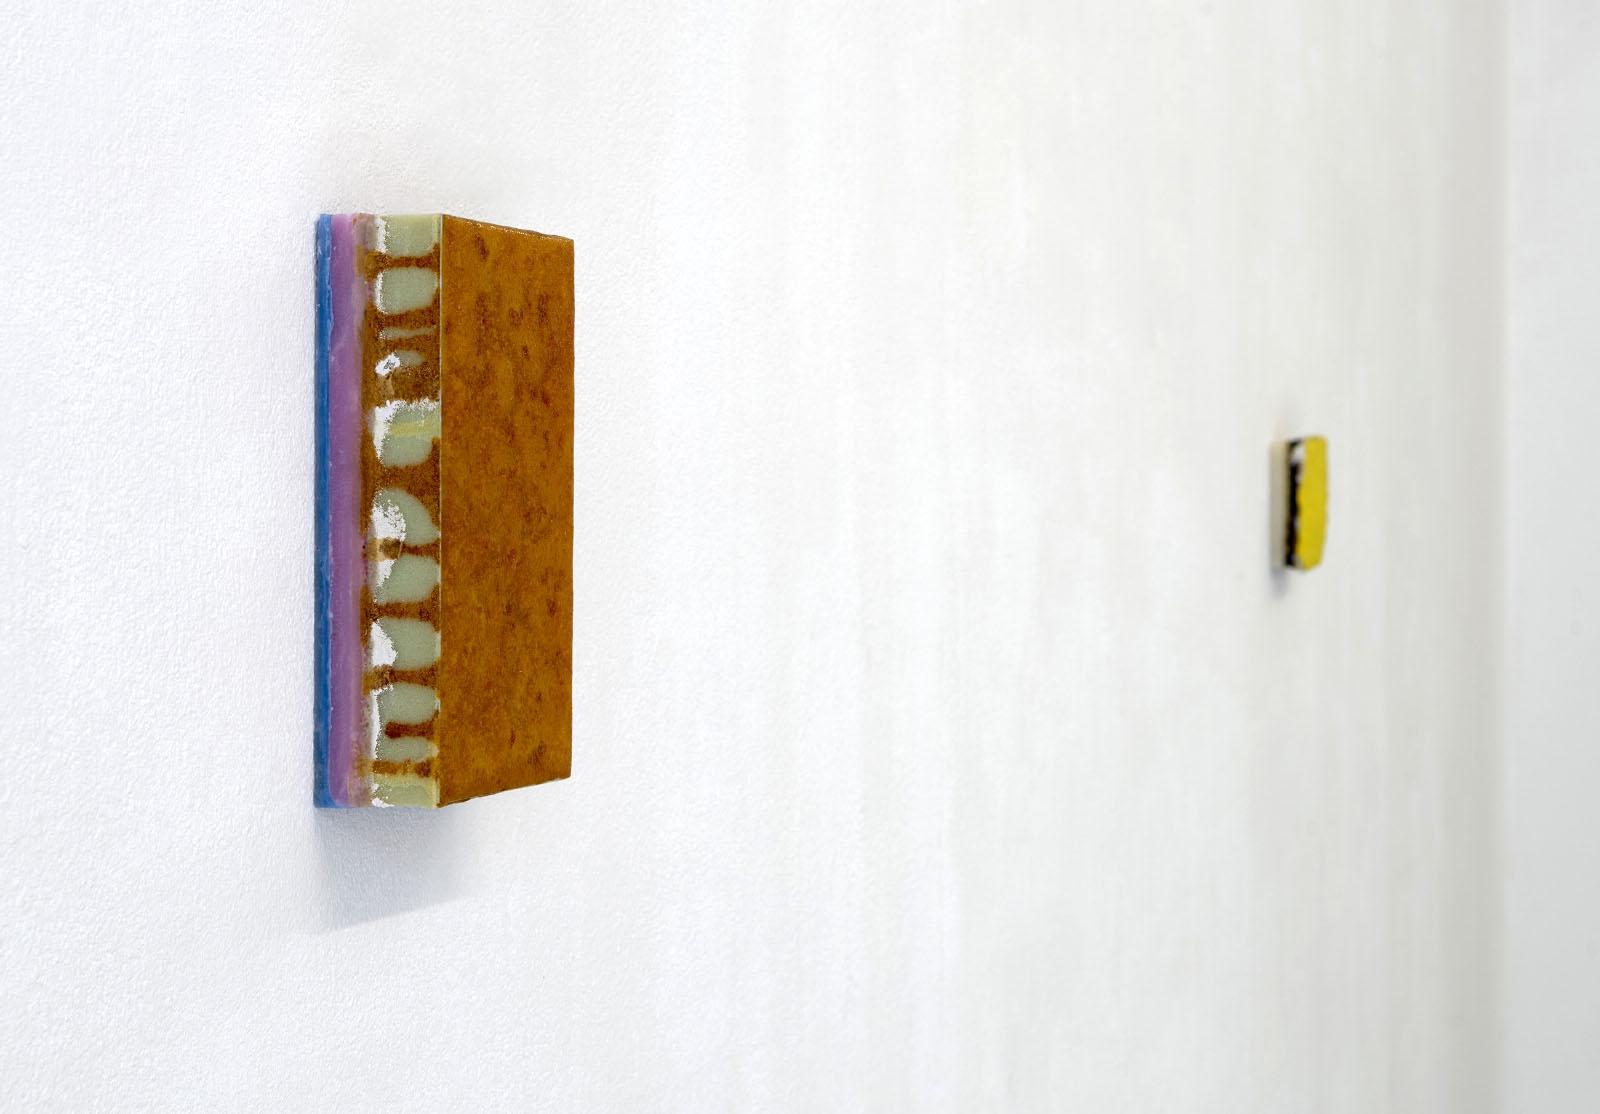 "<a href=""http://kubaparis.com/in-sweet-succession-material-matters-kuratiert-von-muriel-meyer-und-marina-ru%CC%88diger/"" target=""_blank"">Installationsfotos der Ausstellung ""In Sweet Succession: Material matters"" im Basis e. V. Projektraum in Frankfurt am Main</a>"